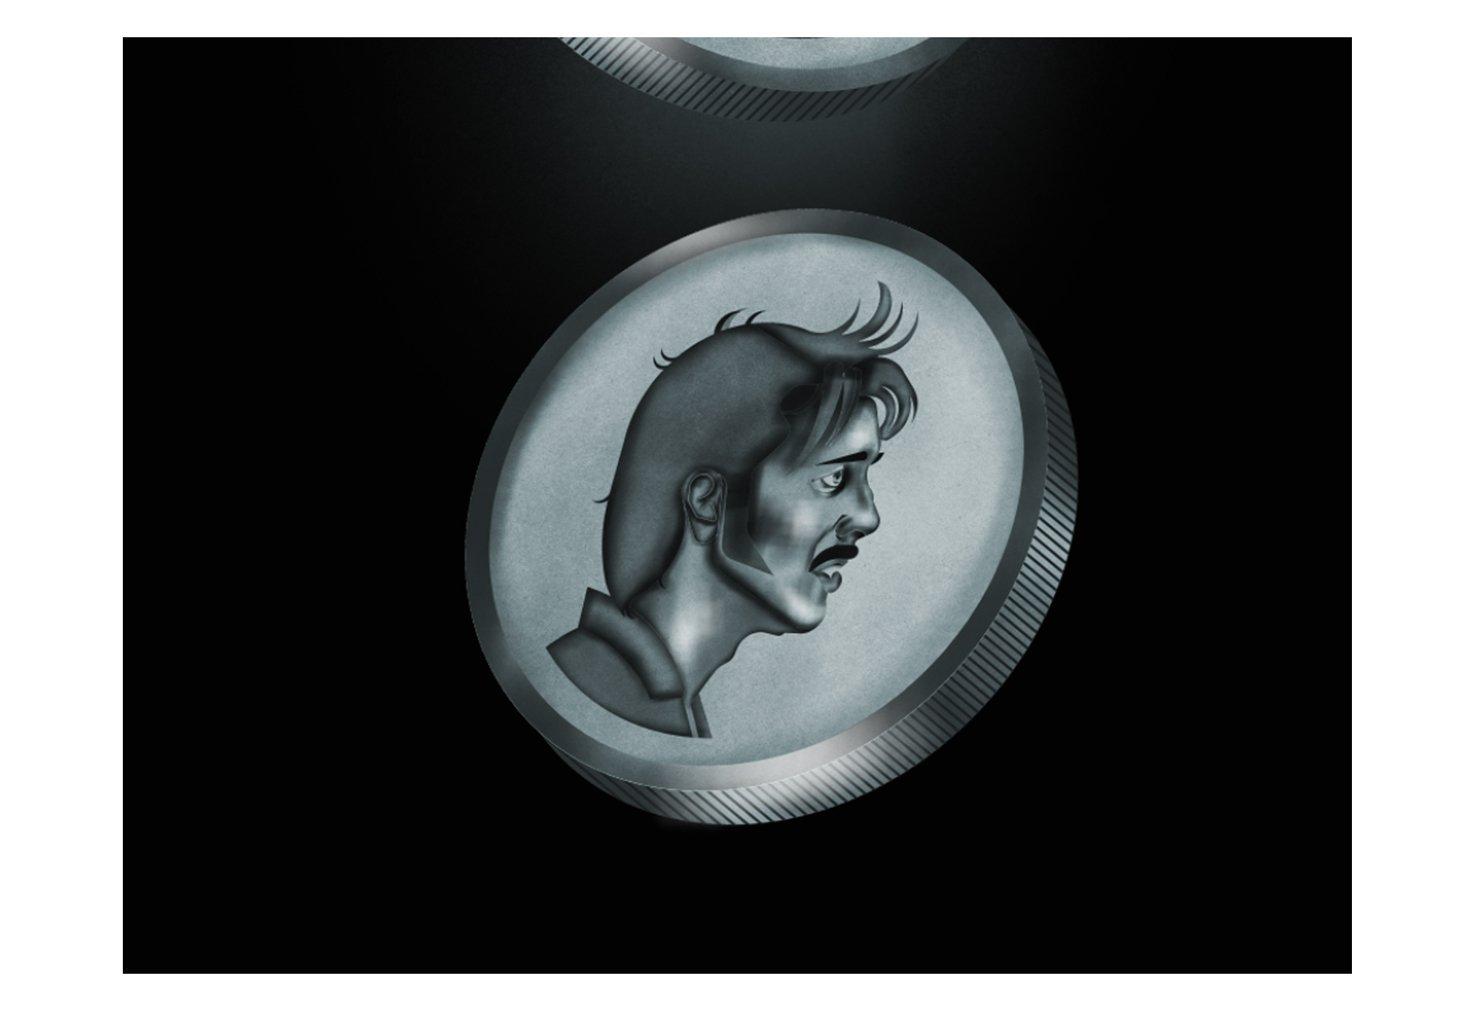 coen-brothers-editorial-illustration-3-alice-iuri